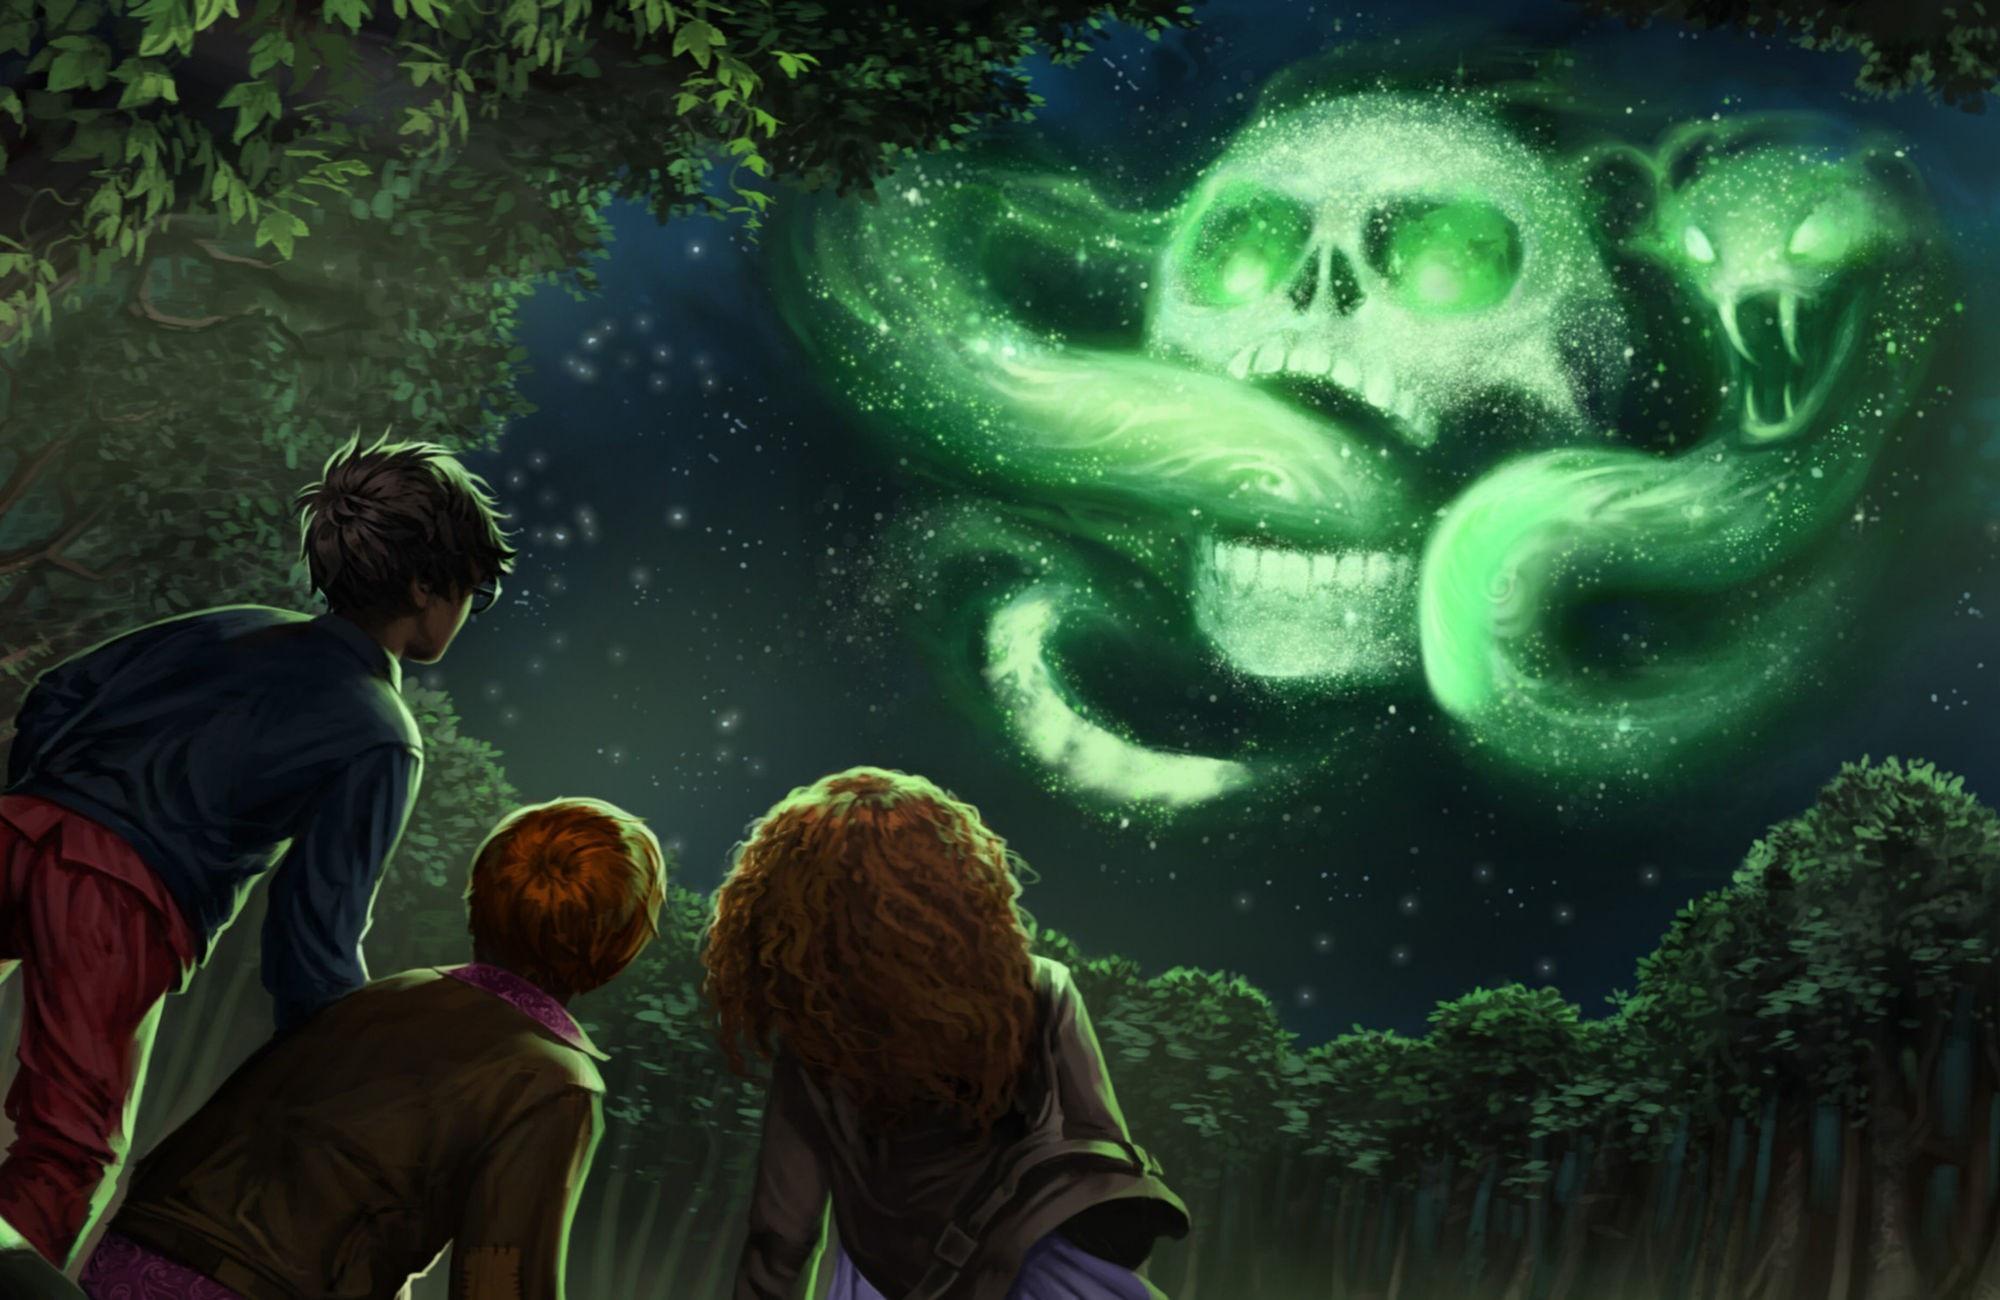 Voldemort Iphone Wallpaper Harry Potter And The Goblet Of Fire Fondo De Pantalla Hd